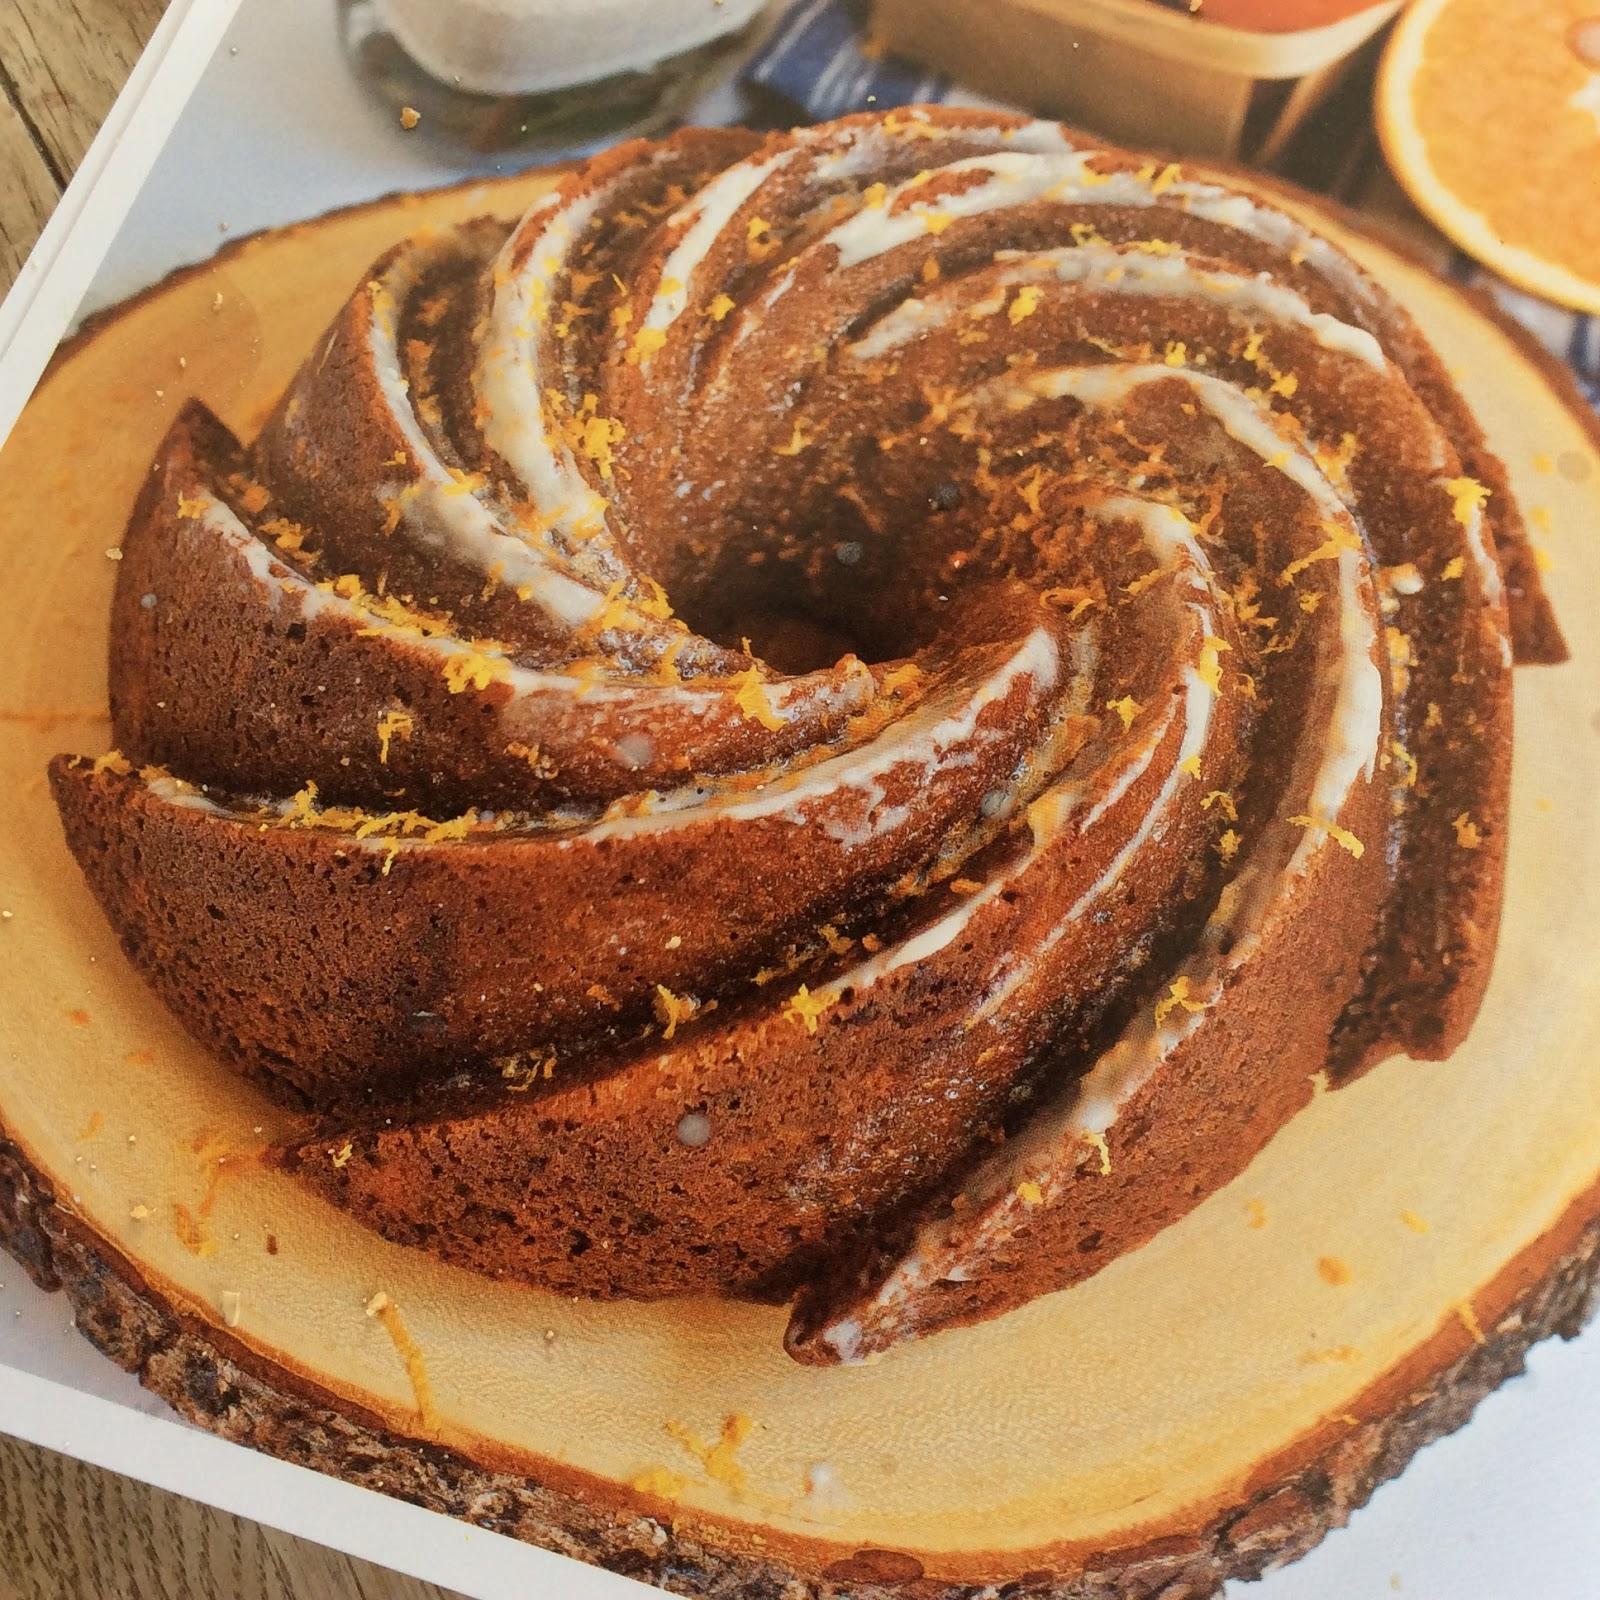 Fan My Flame: A Marbled Chocolate Orange Bundt Cake